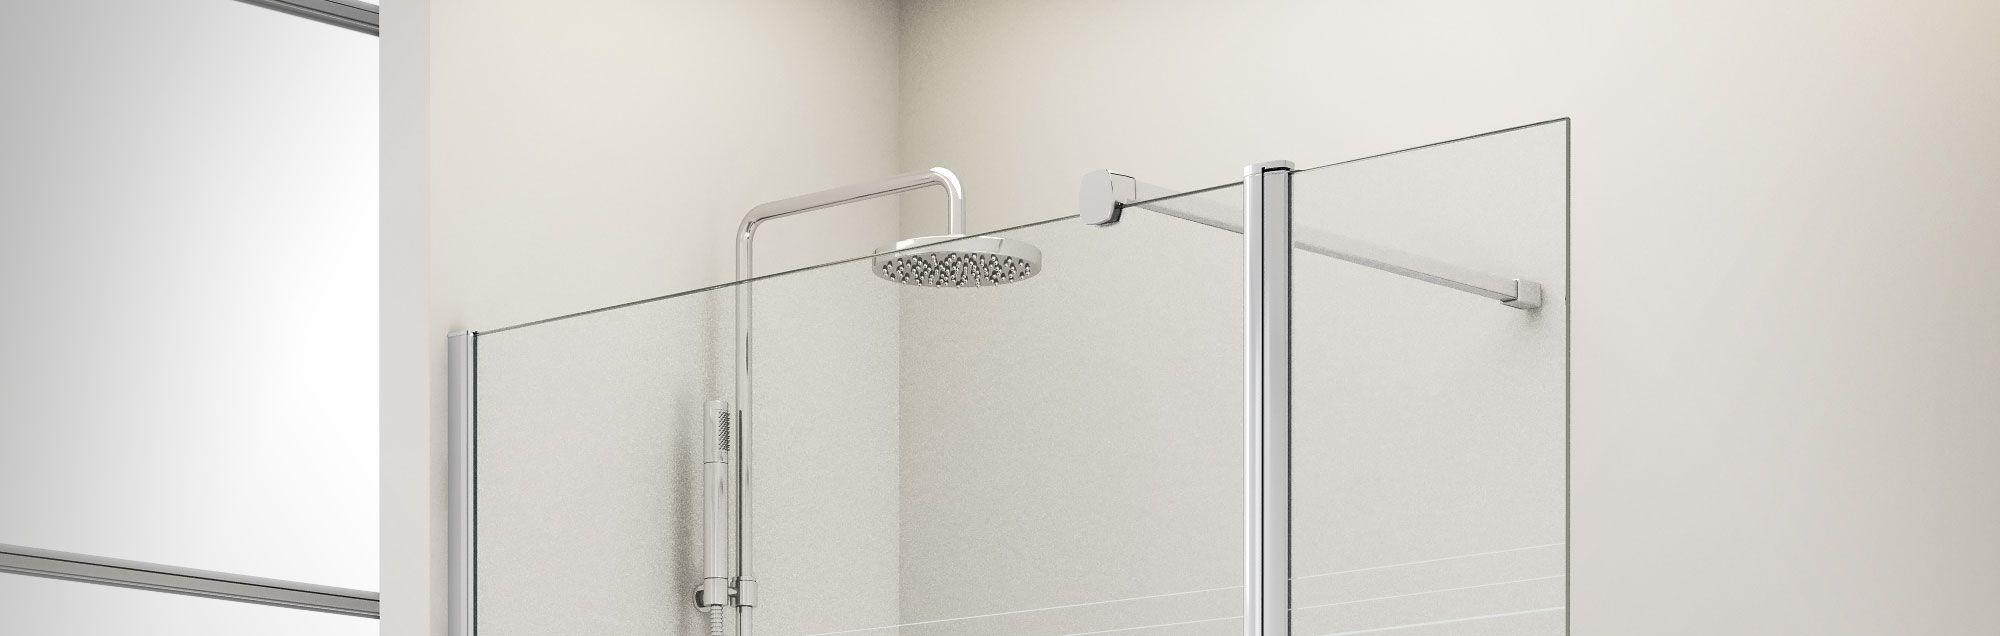 PROFILTEK Standard Collection made to measure bathroom enclosures